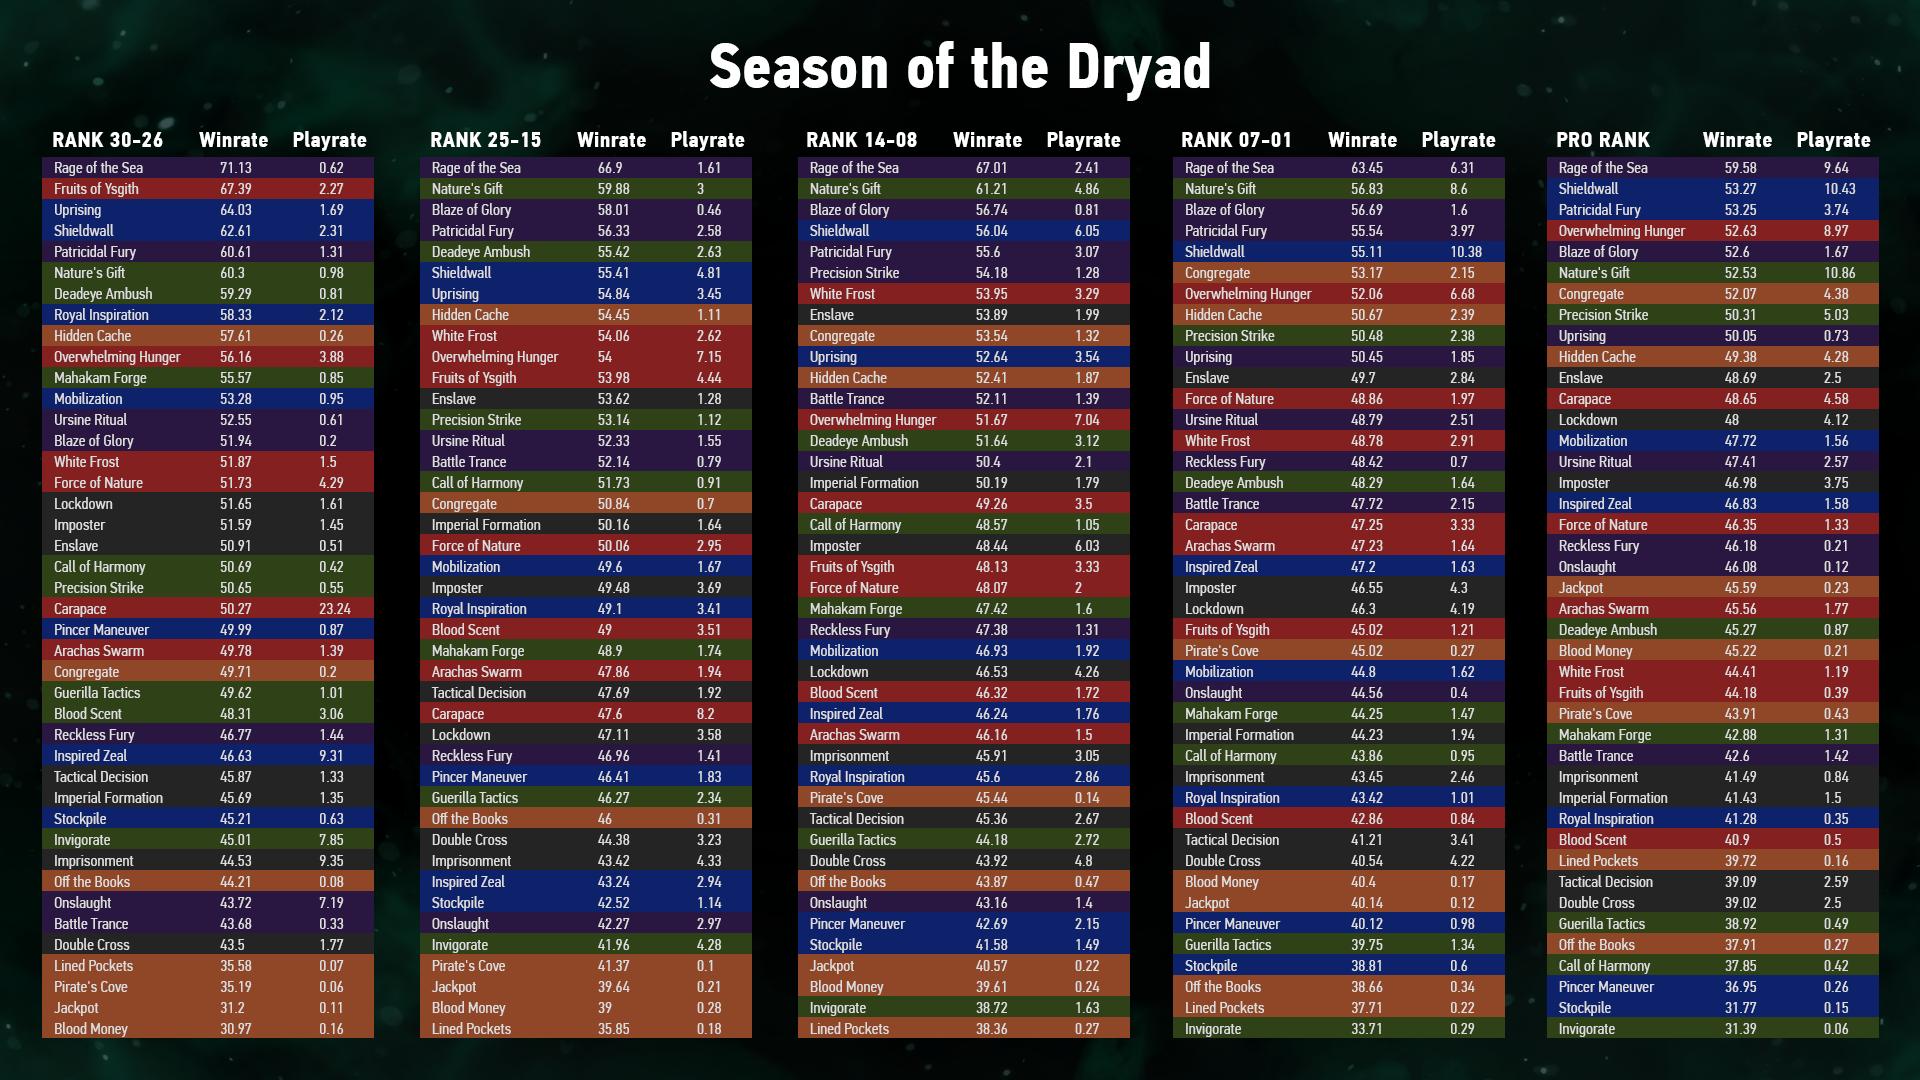 Season_of_Dryad_data.png